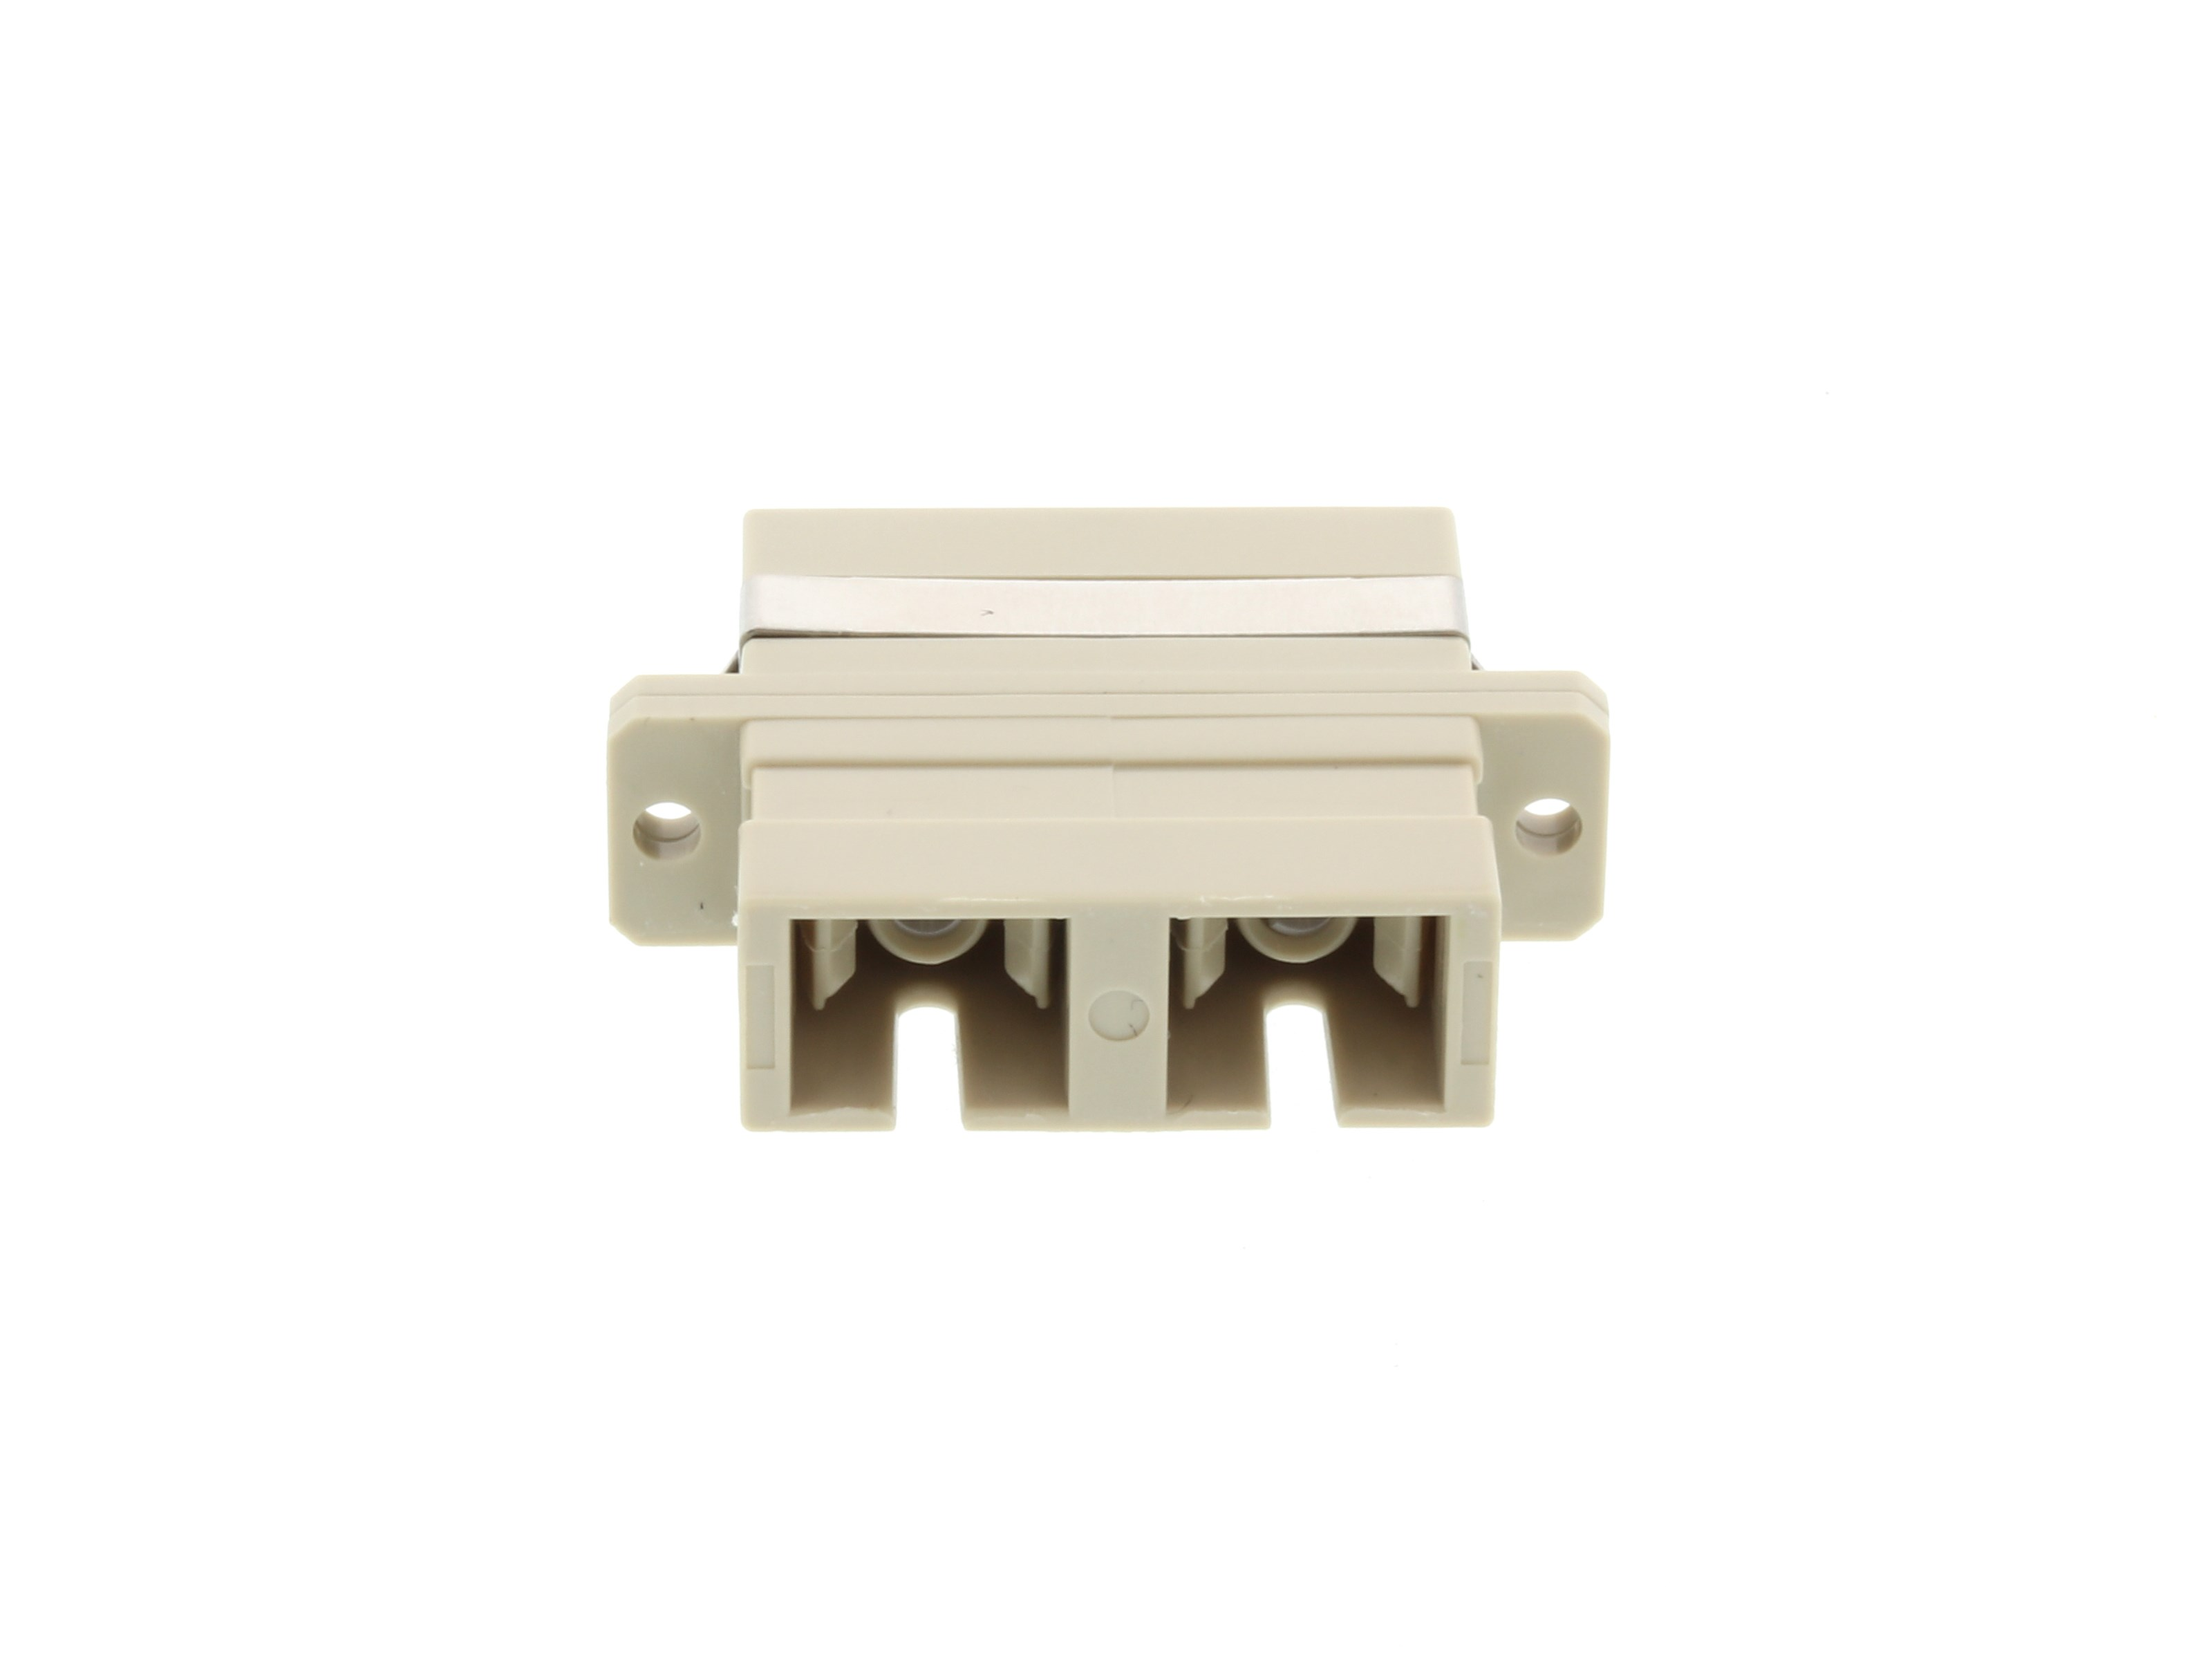 SC Multimode Duplex Fiber Adapter - PC (Physical Connector)